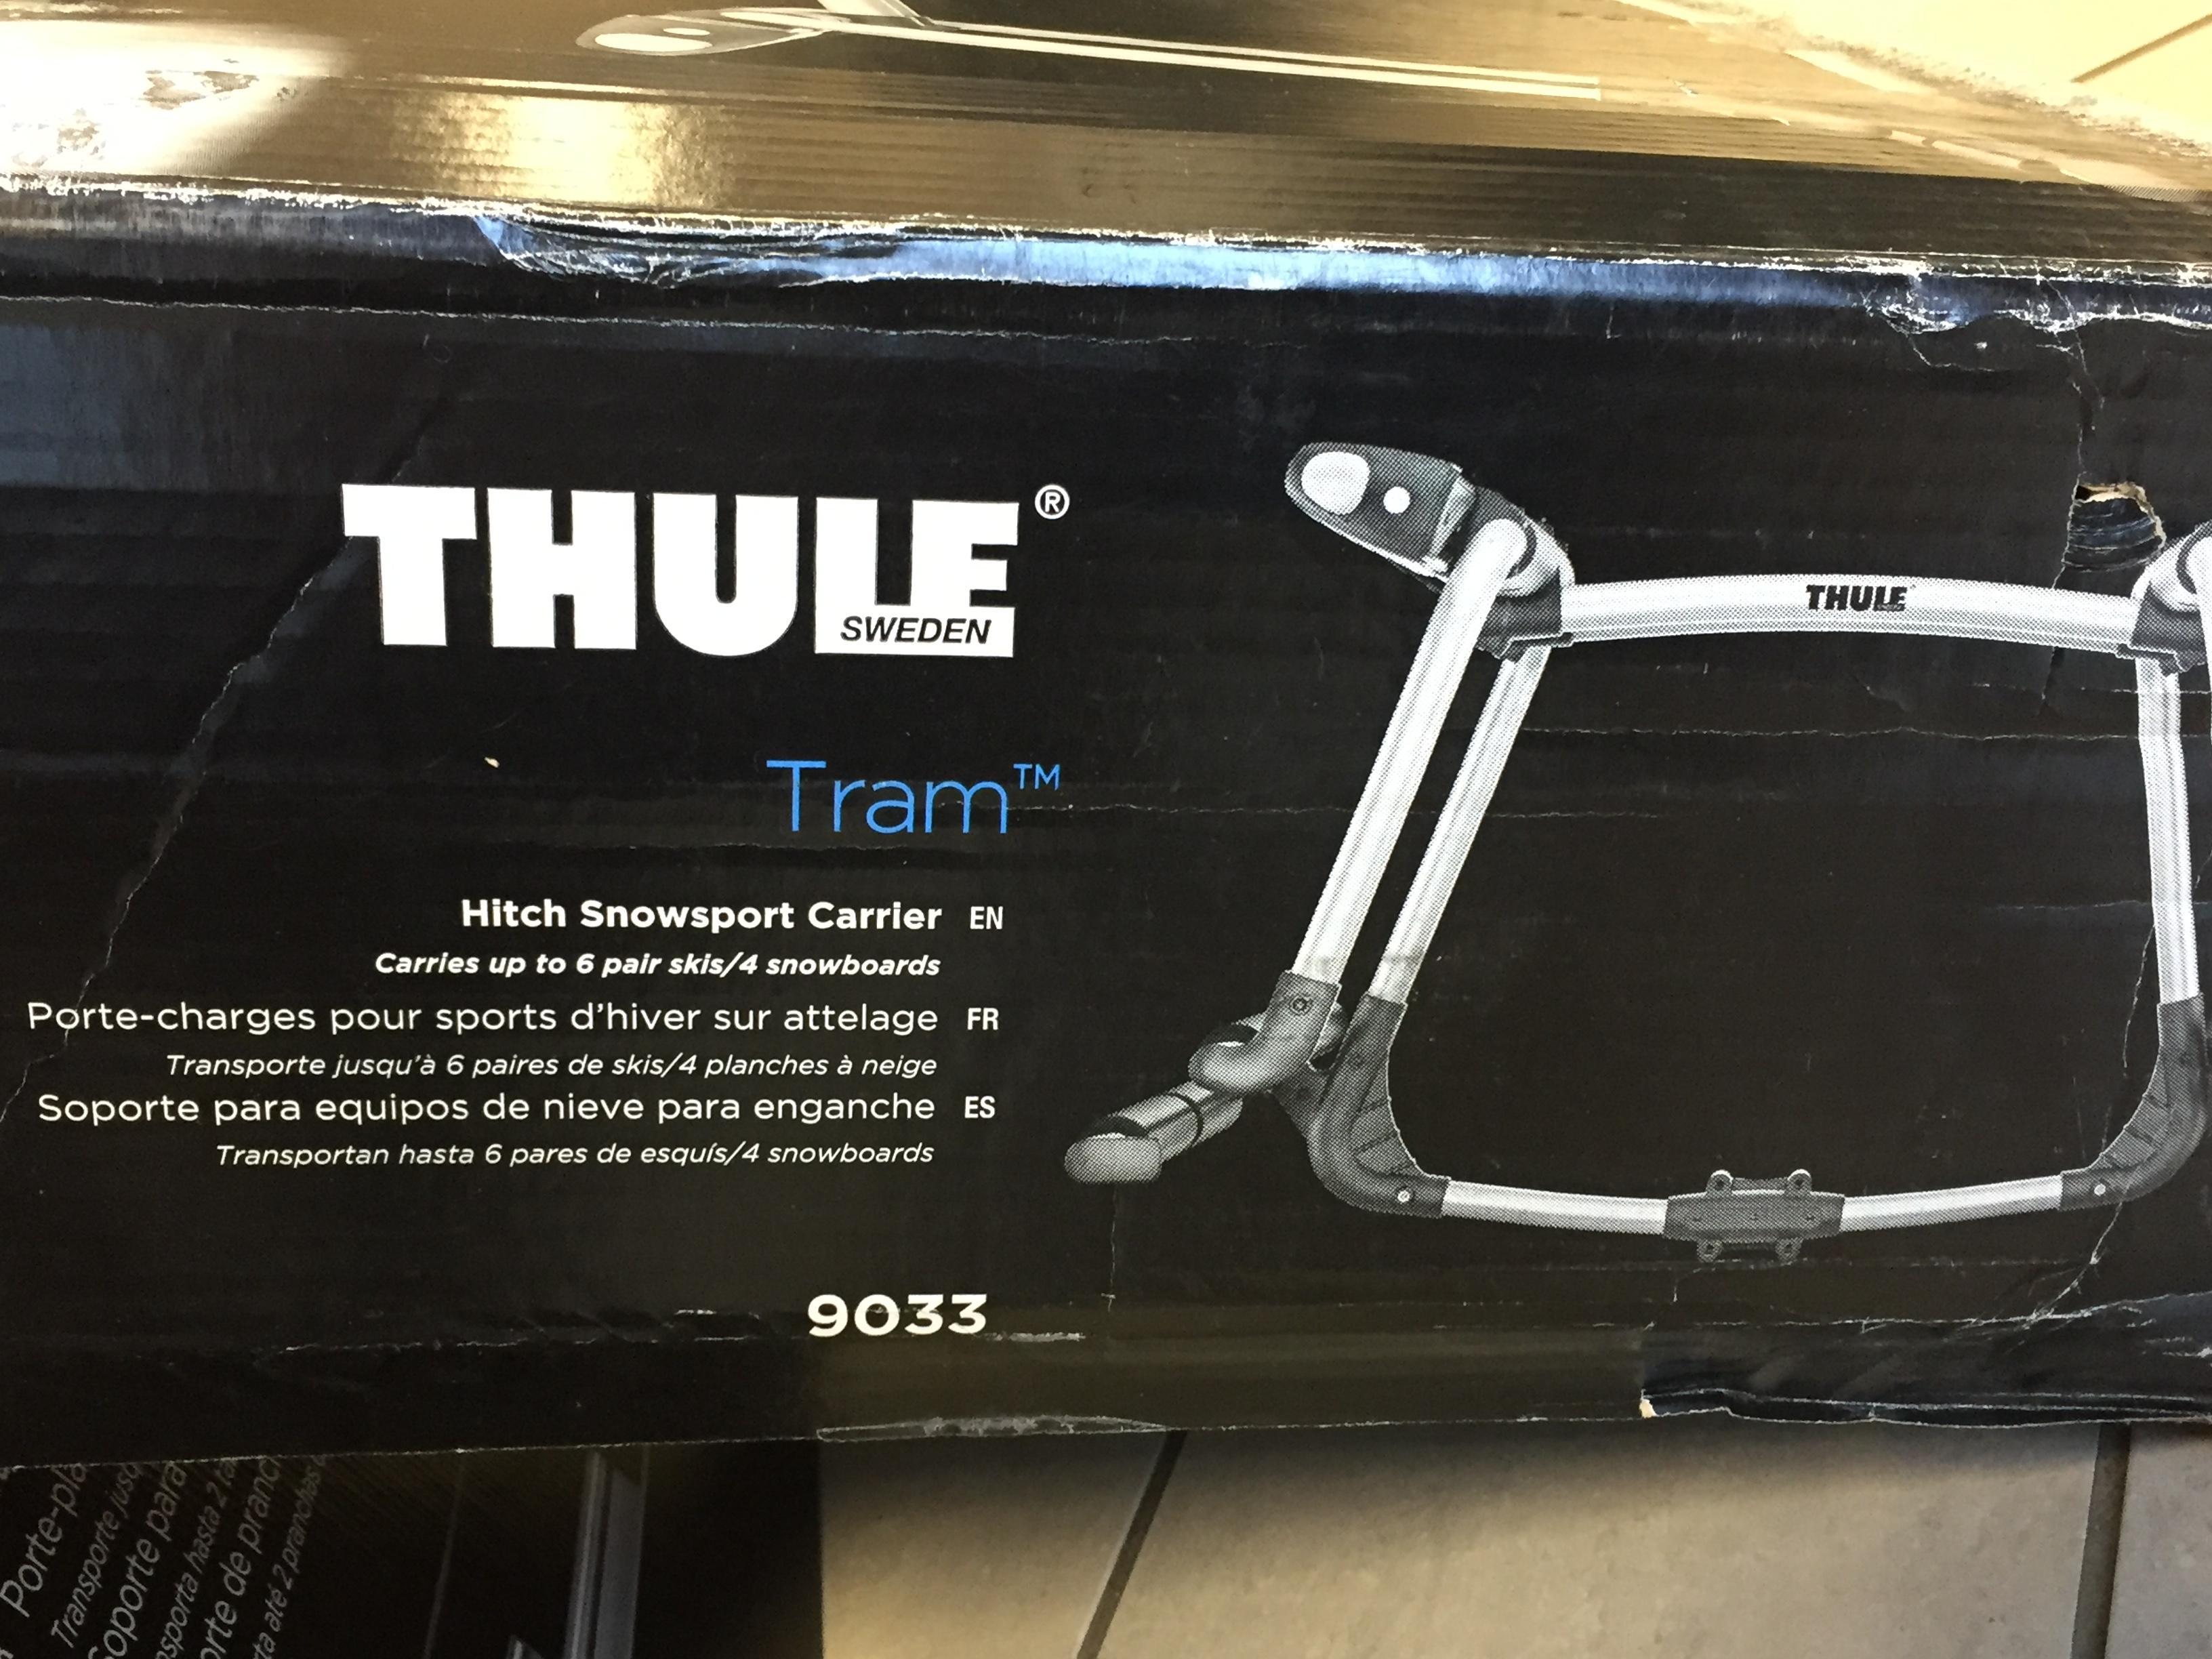 Thule Tram Hitch Snowsport Carrier